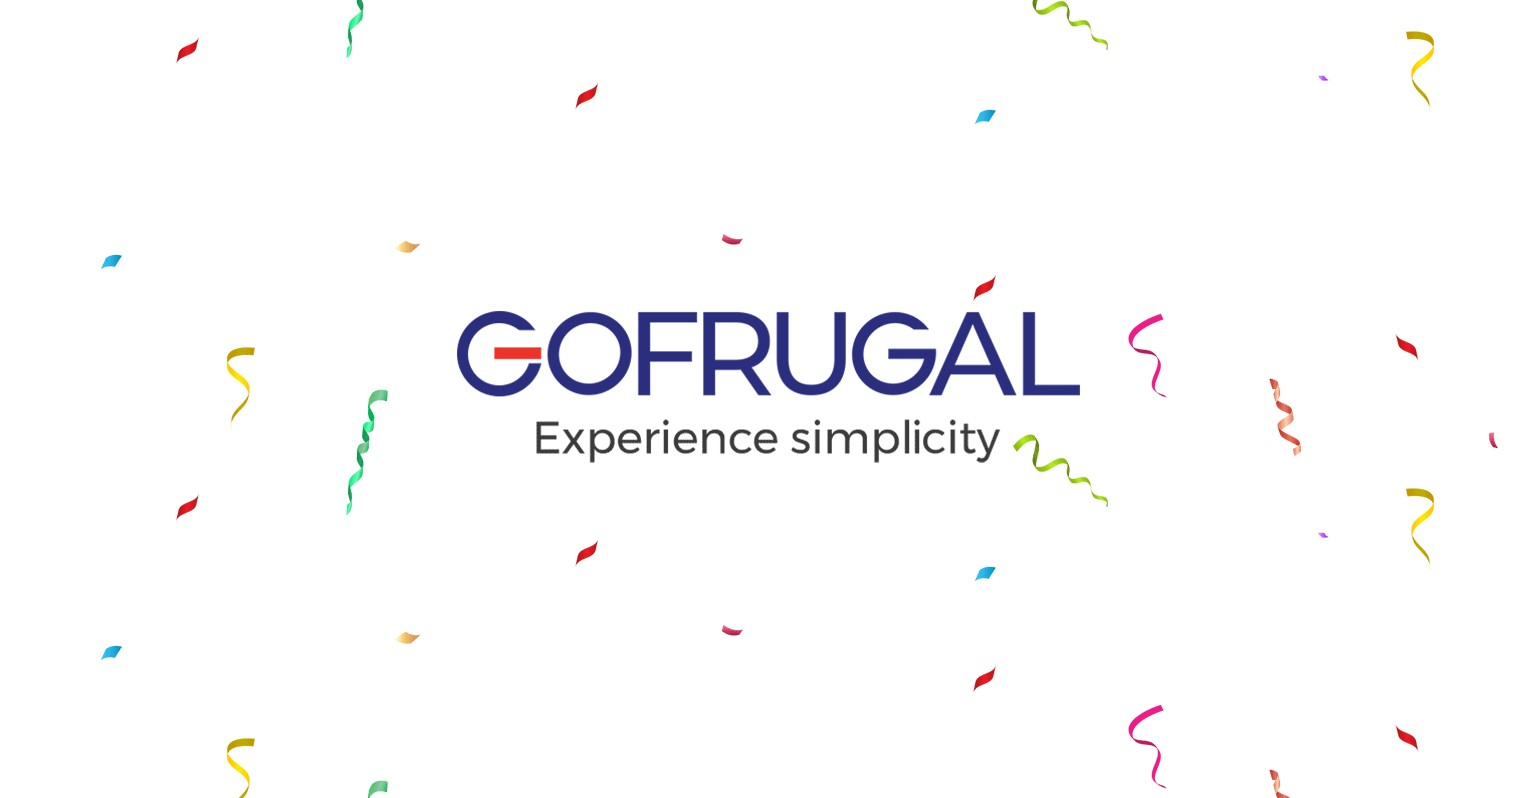 GOFRUGAL Technologies Pvt Ltd | LinkedIn